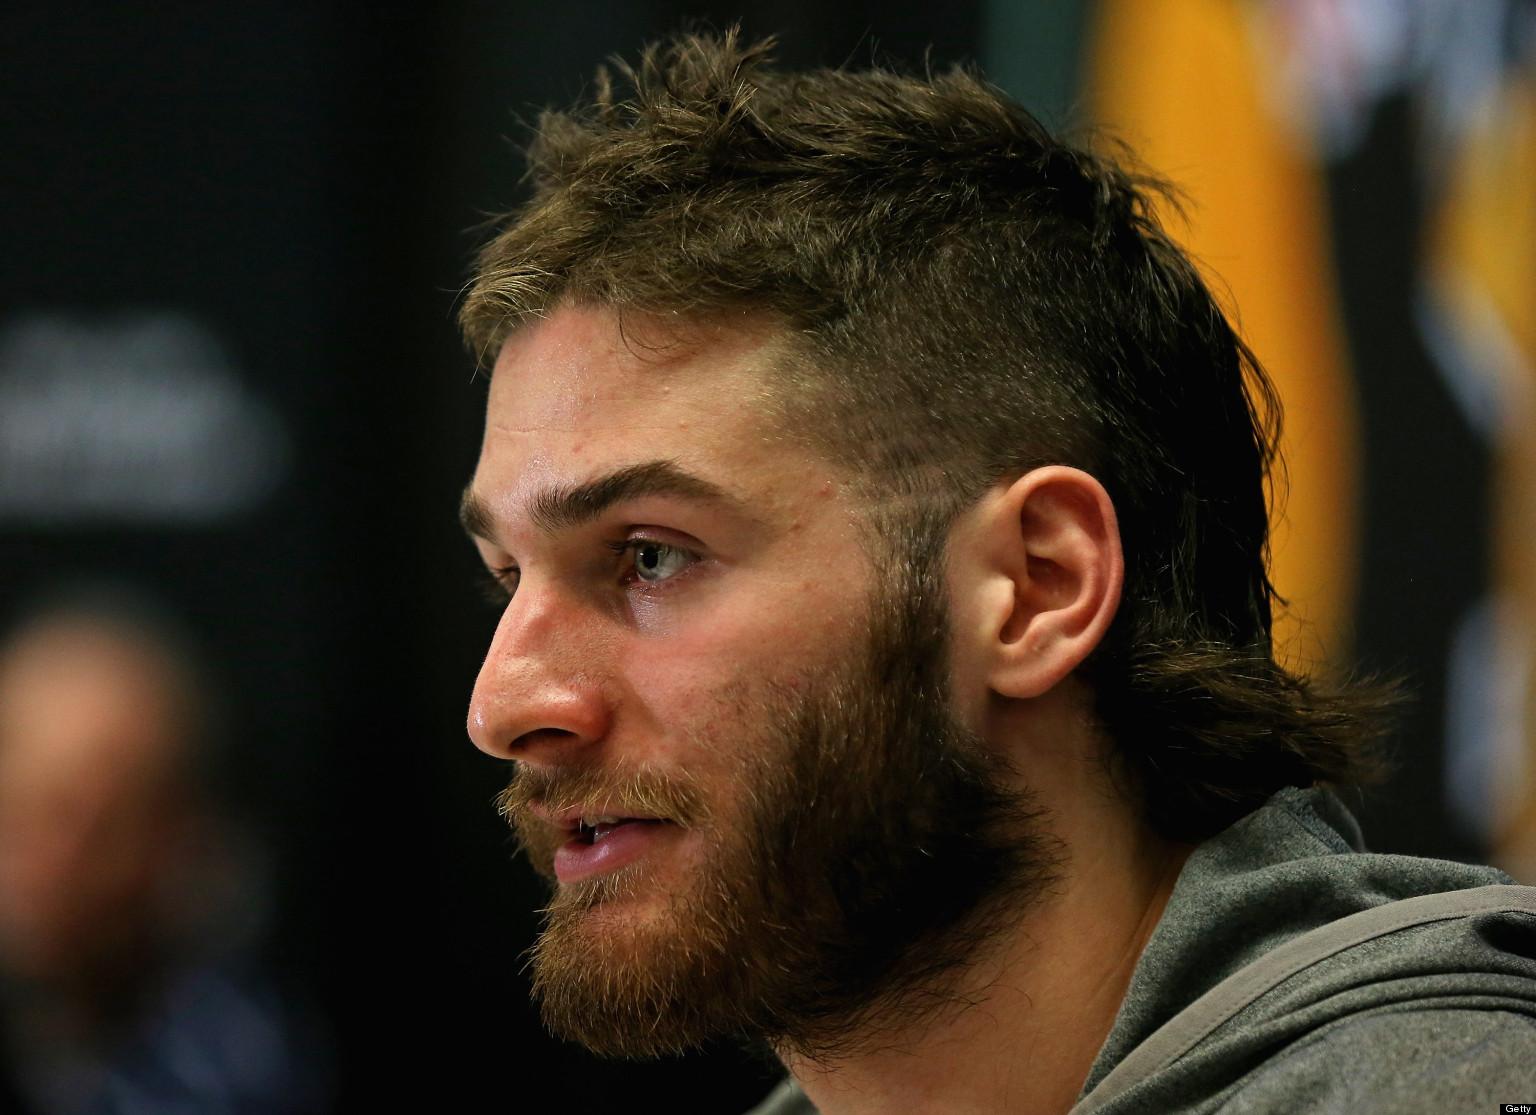 Hockey Playoff Beards Bruins Blackhawks Bring Facial